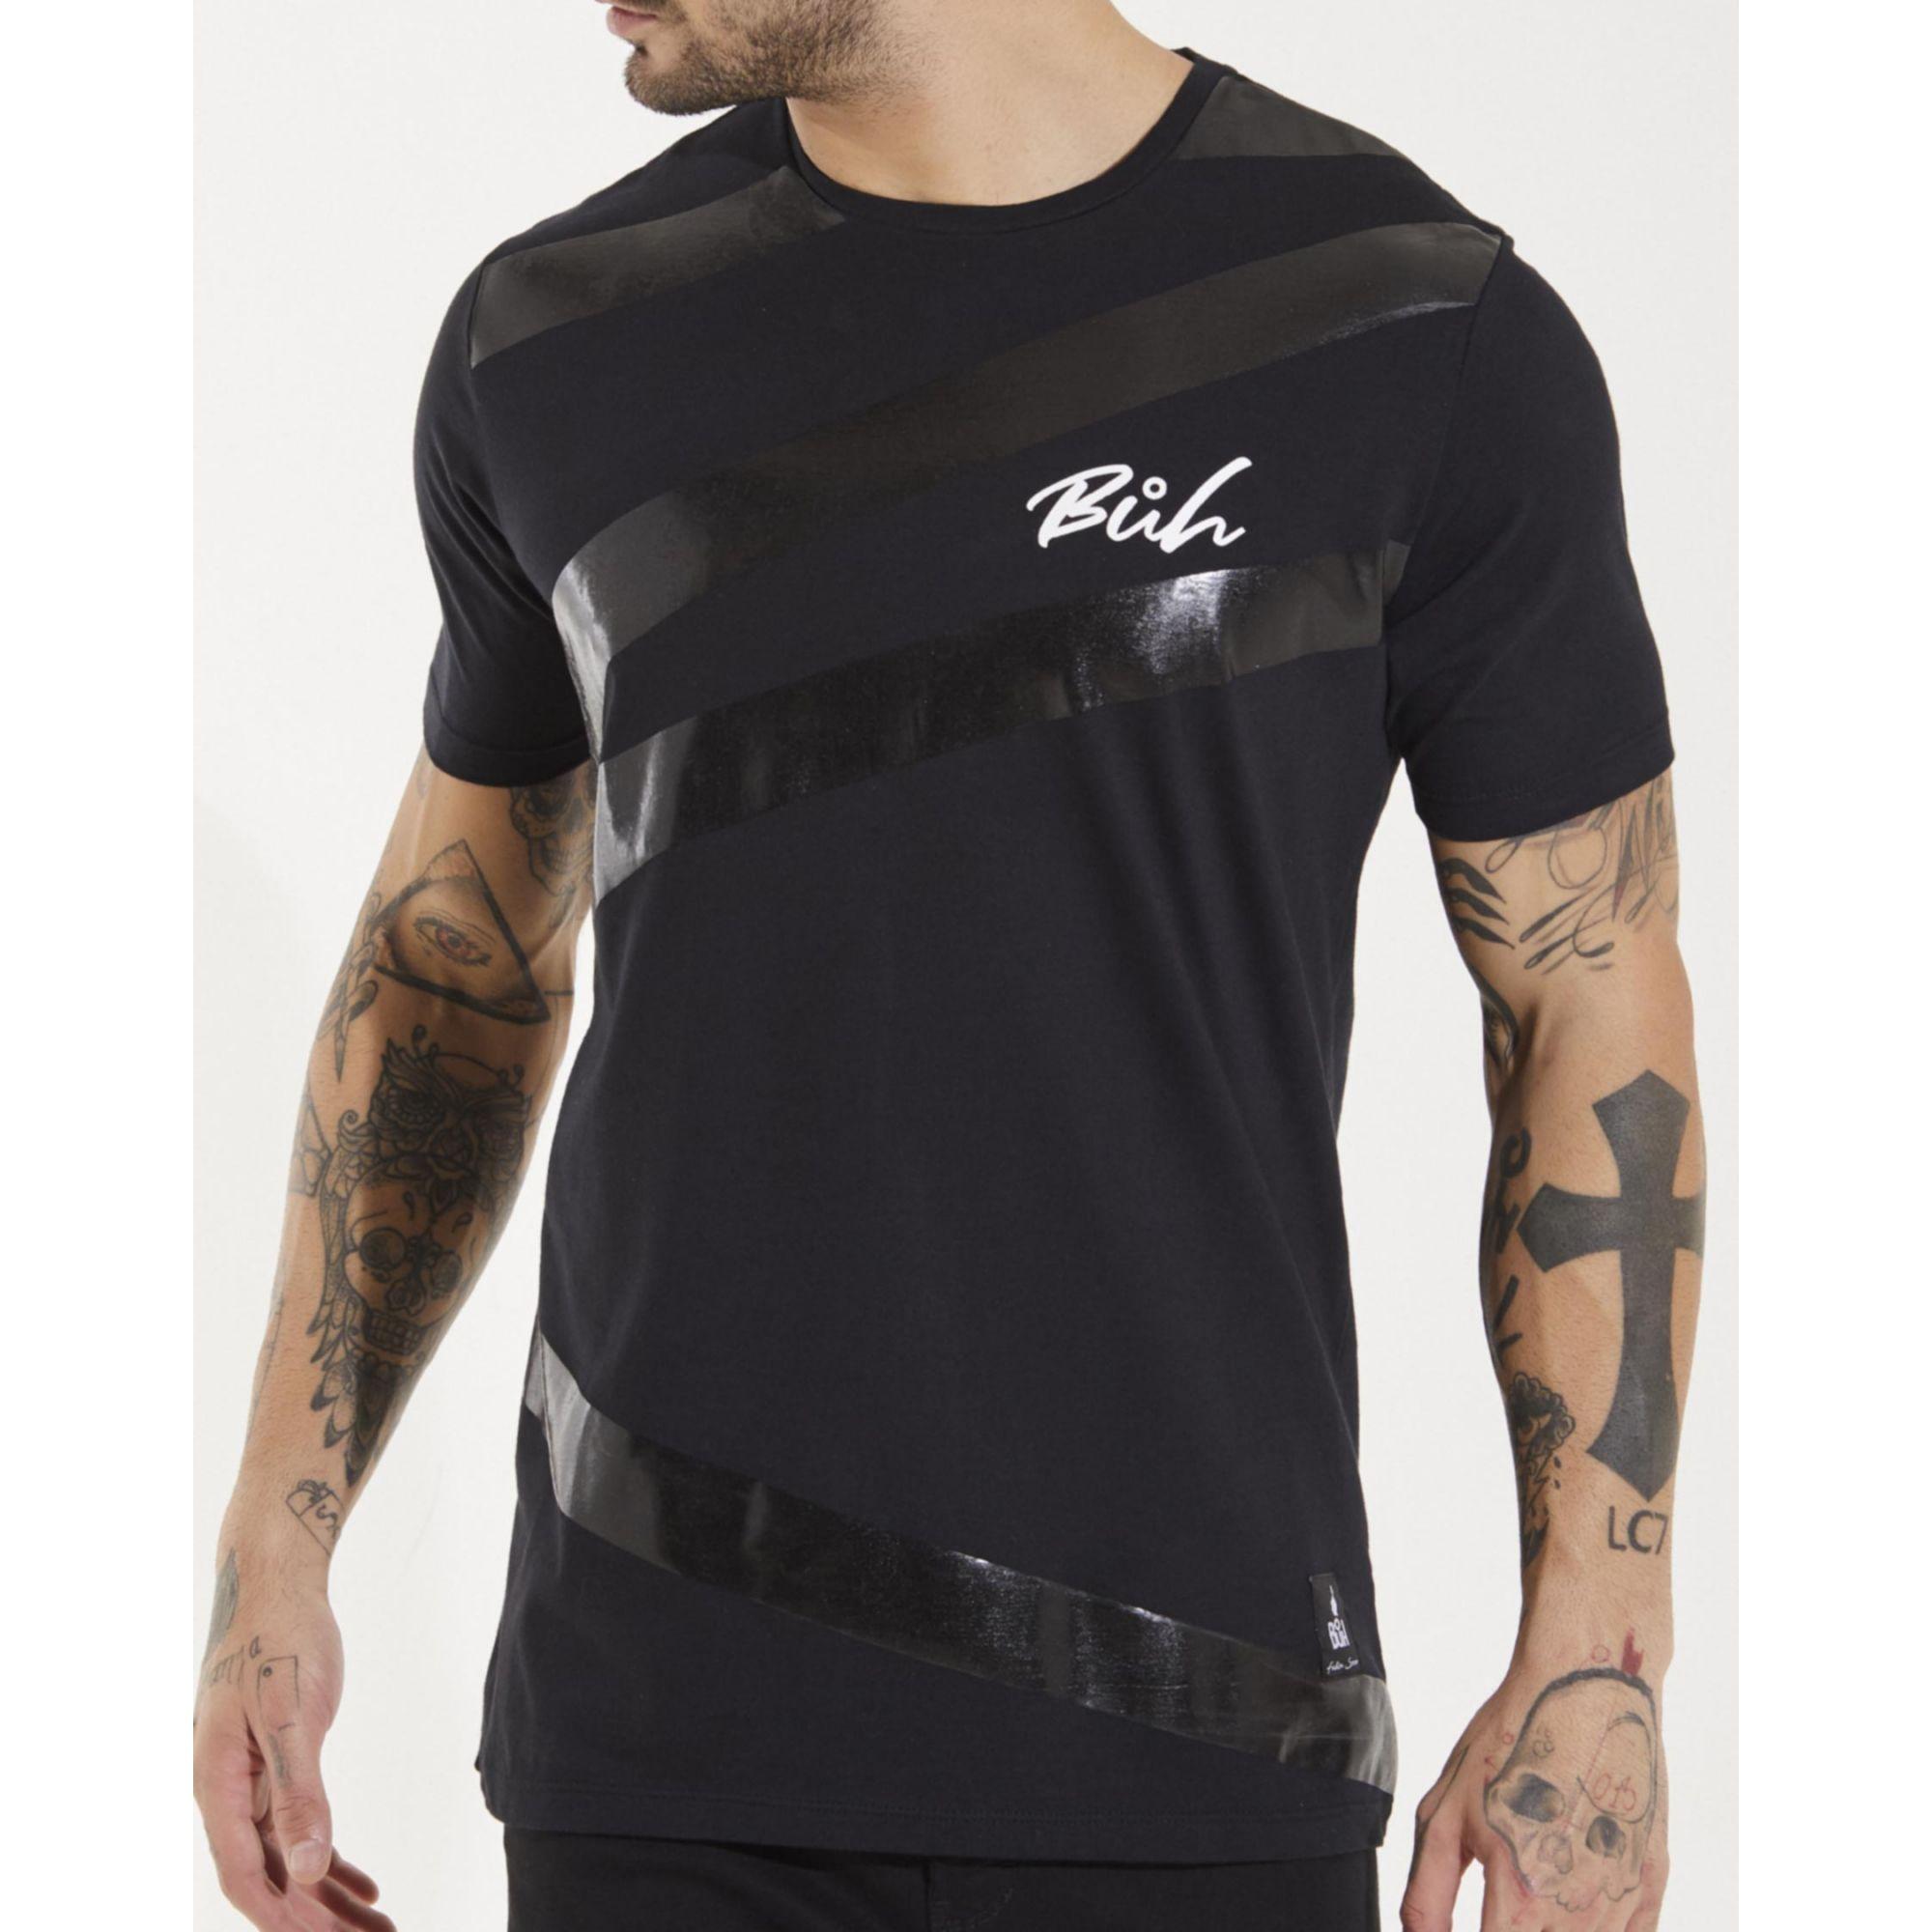 Camiseta Buh Faixa Black